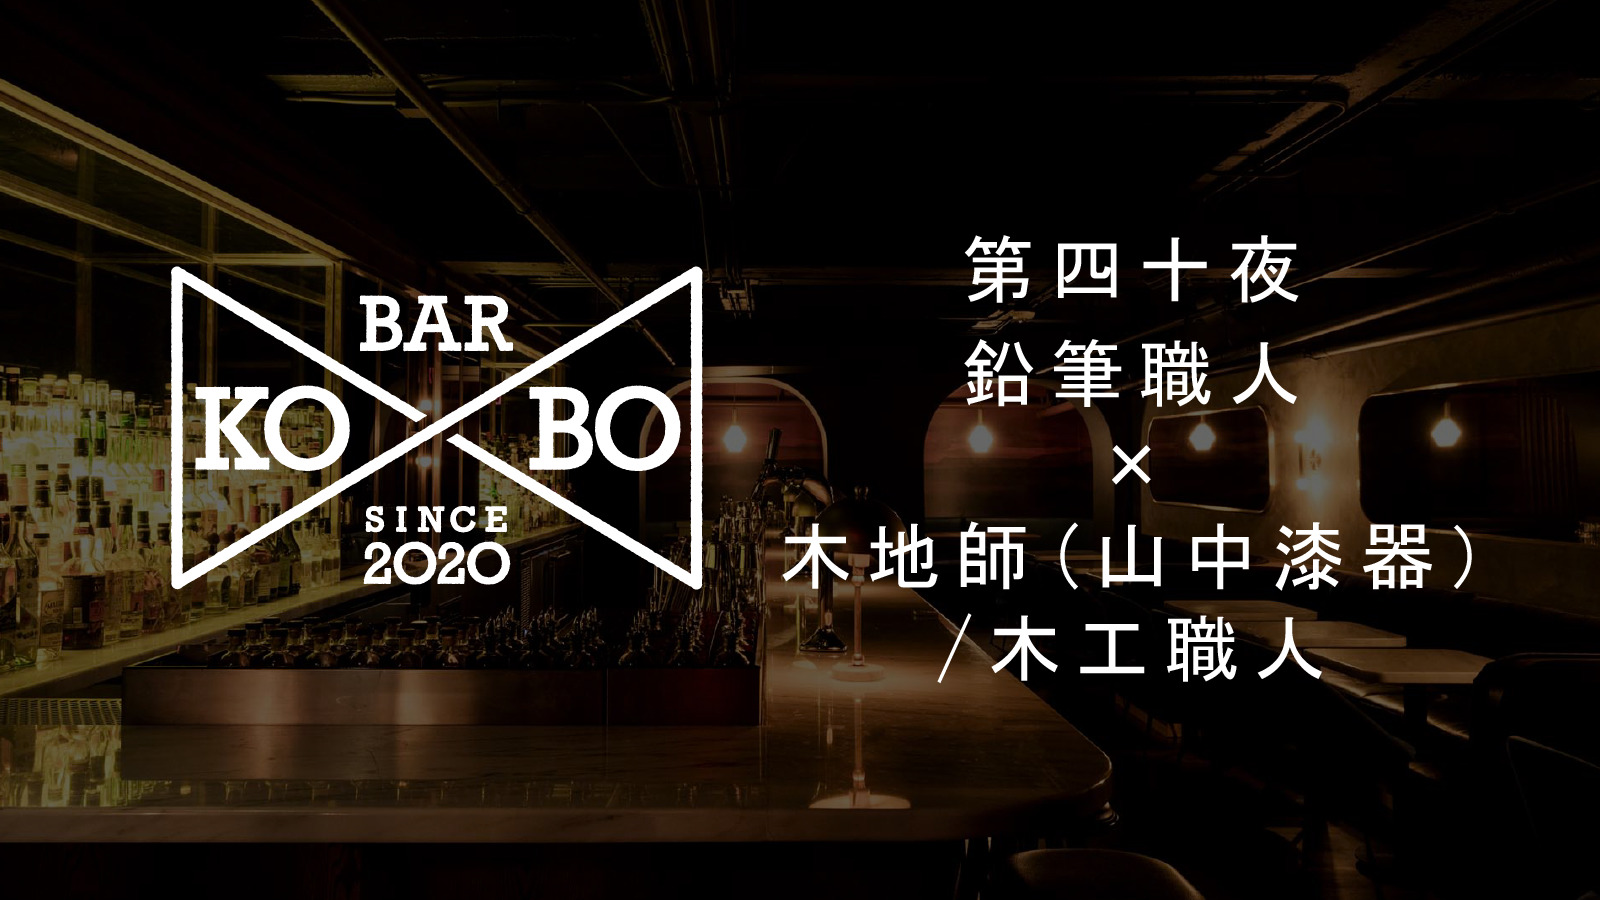 【Bar KO-BO 第四十夜】鉛筆職人×木地師(山中漆器)/木工職人